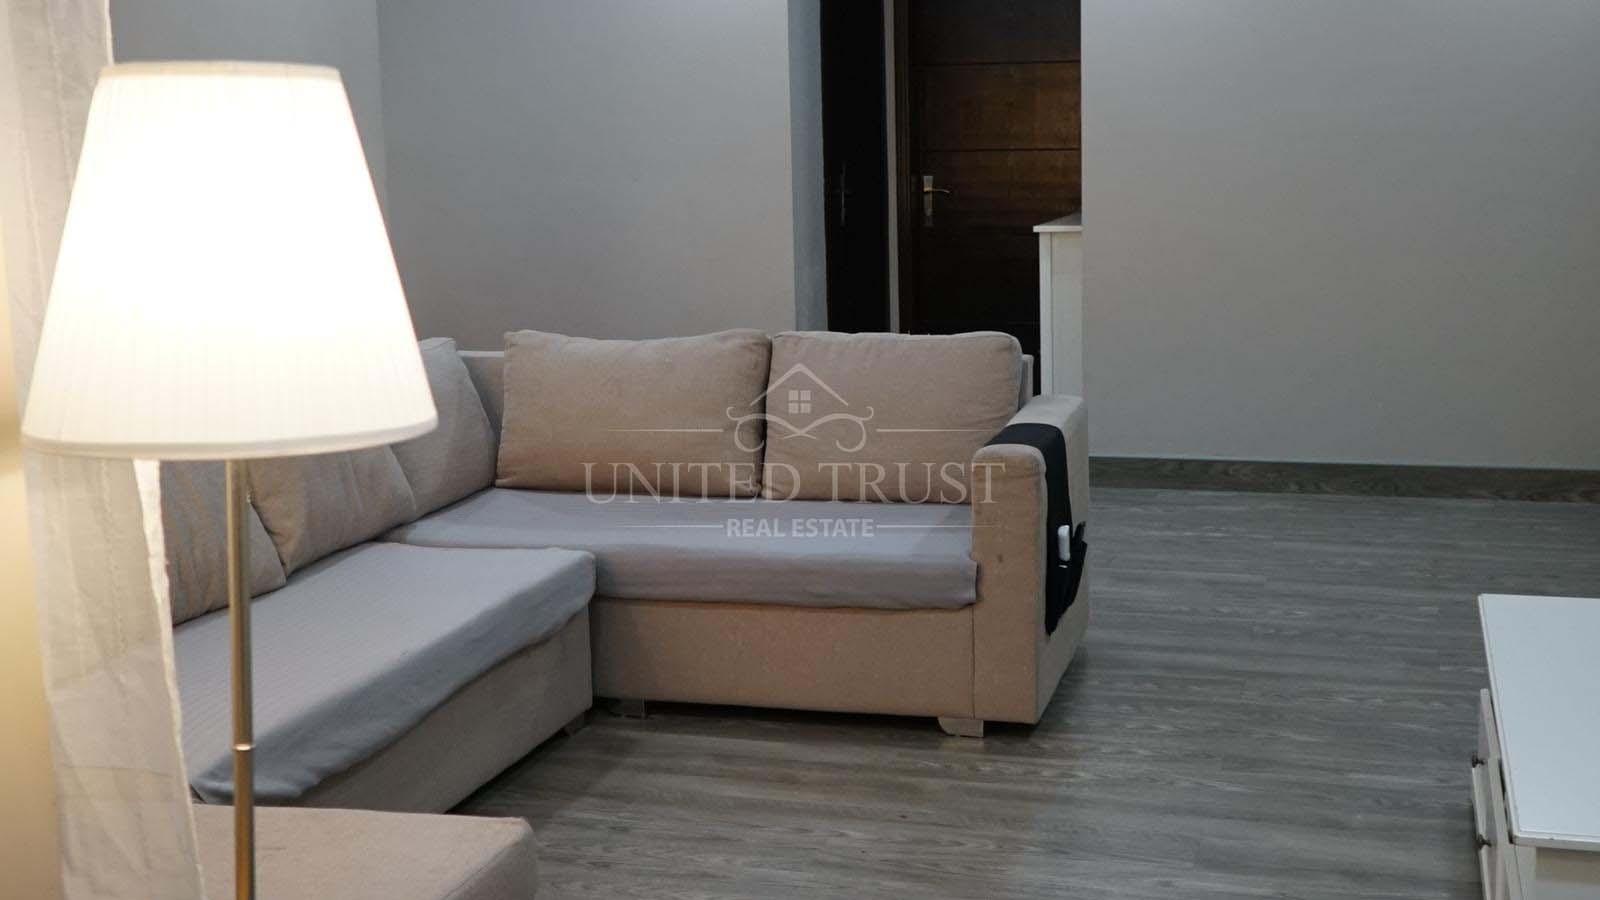 For sale furnished apartment in Riffa Ref: RIF-AZ-008